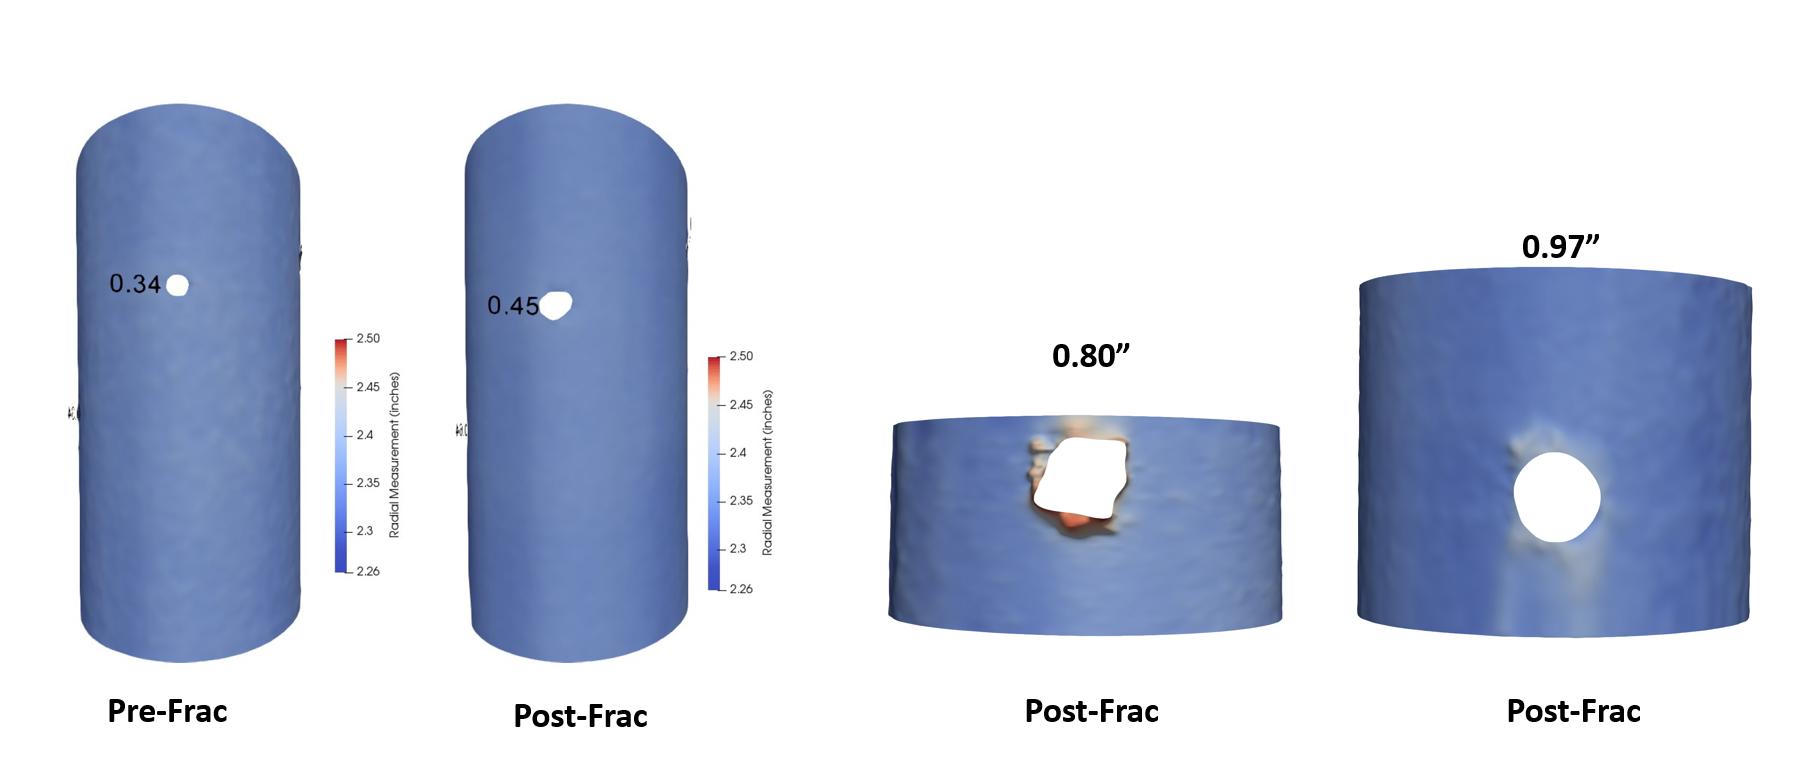 perforation analysis